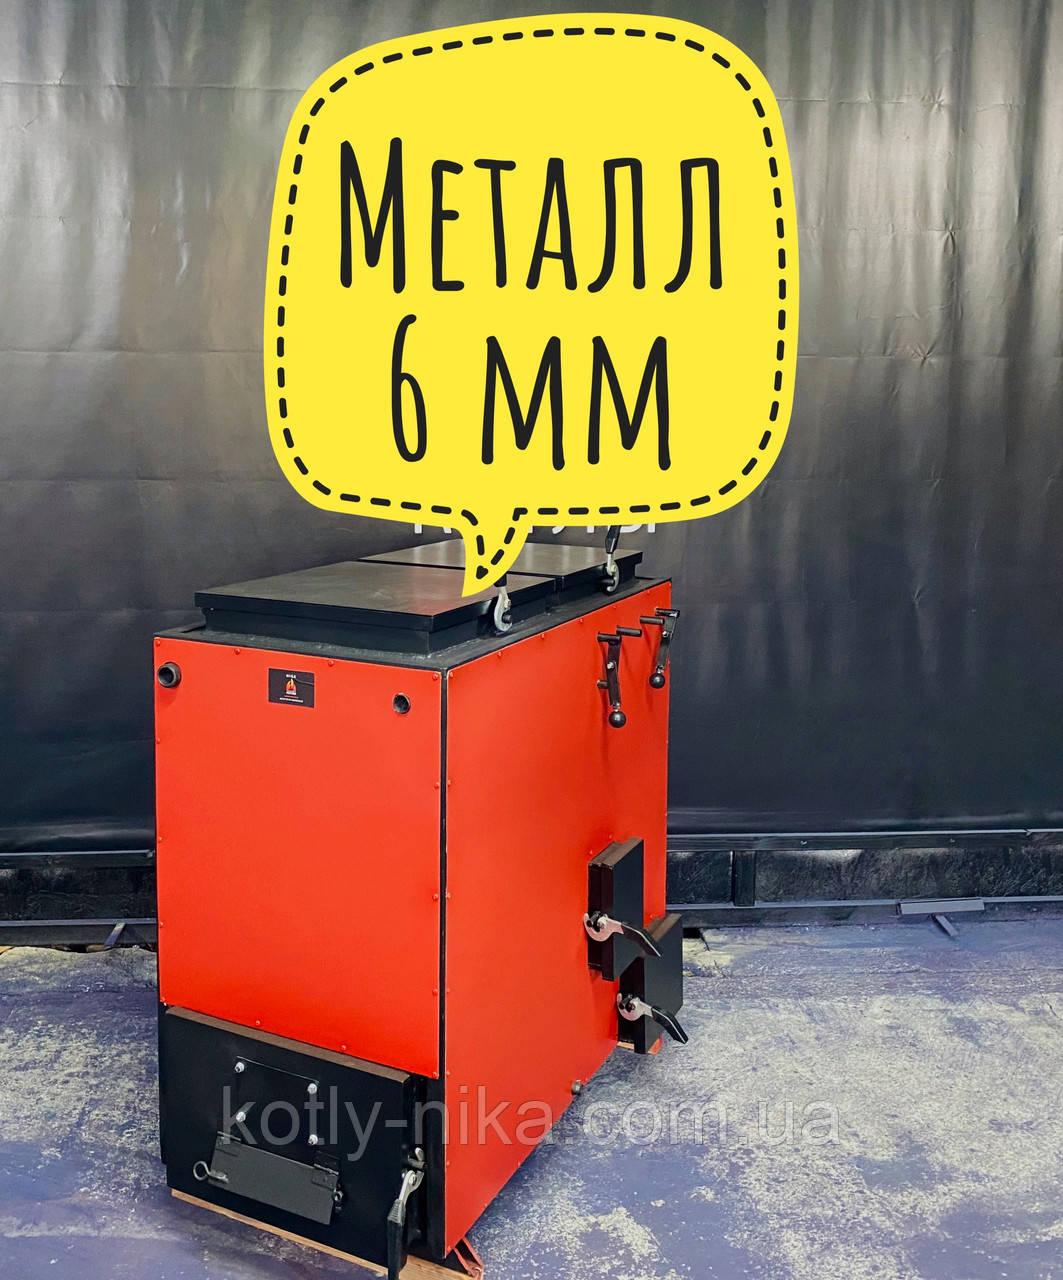 Котел Питон 36 кВт с регулировкой мощности МЕТАЛЛ 6 мм